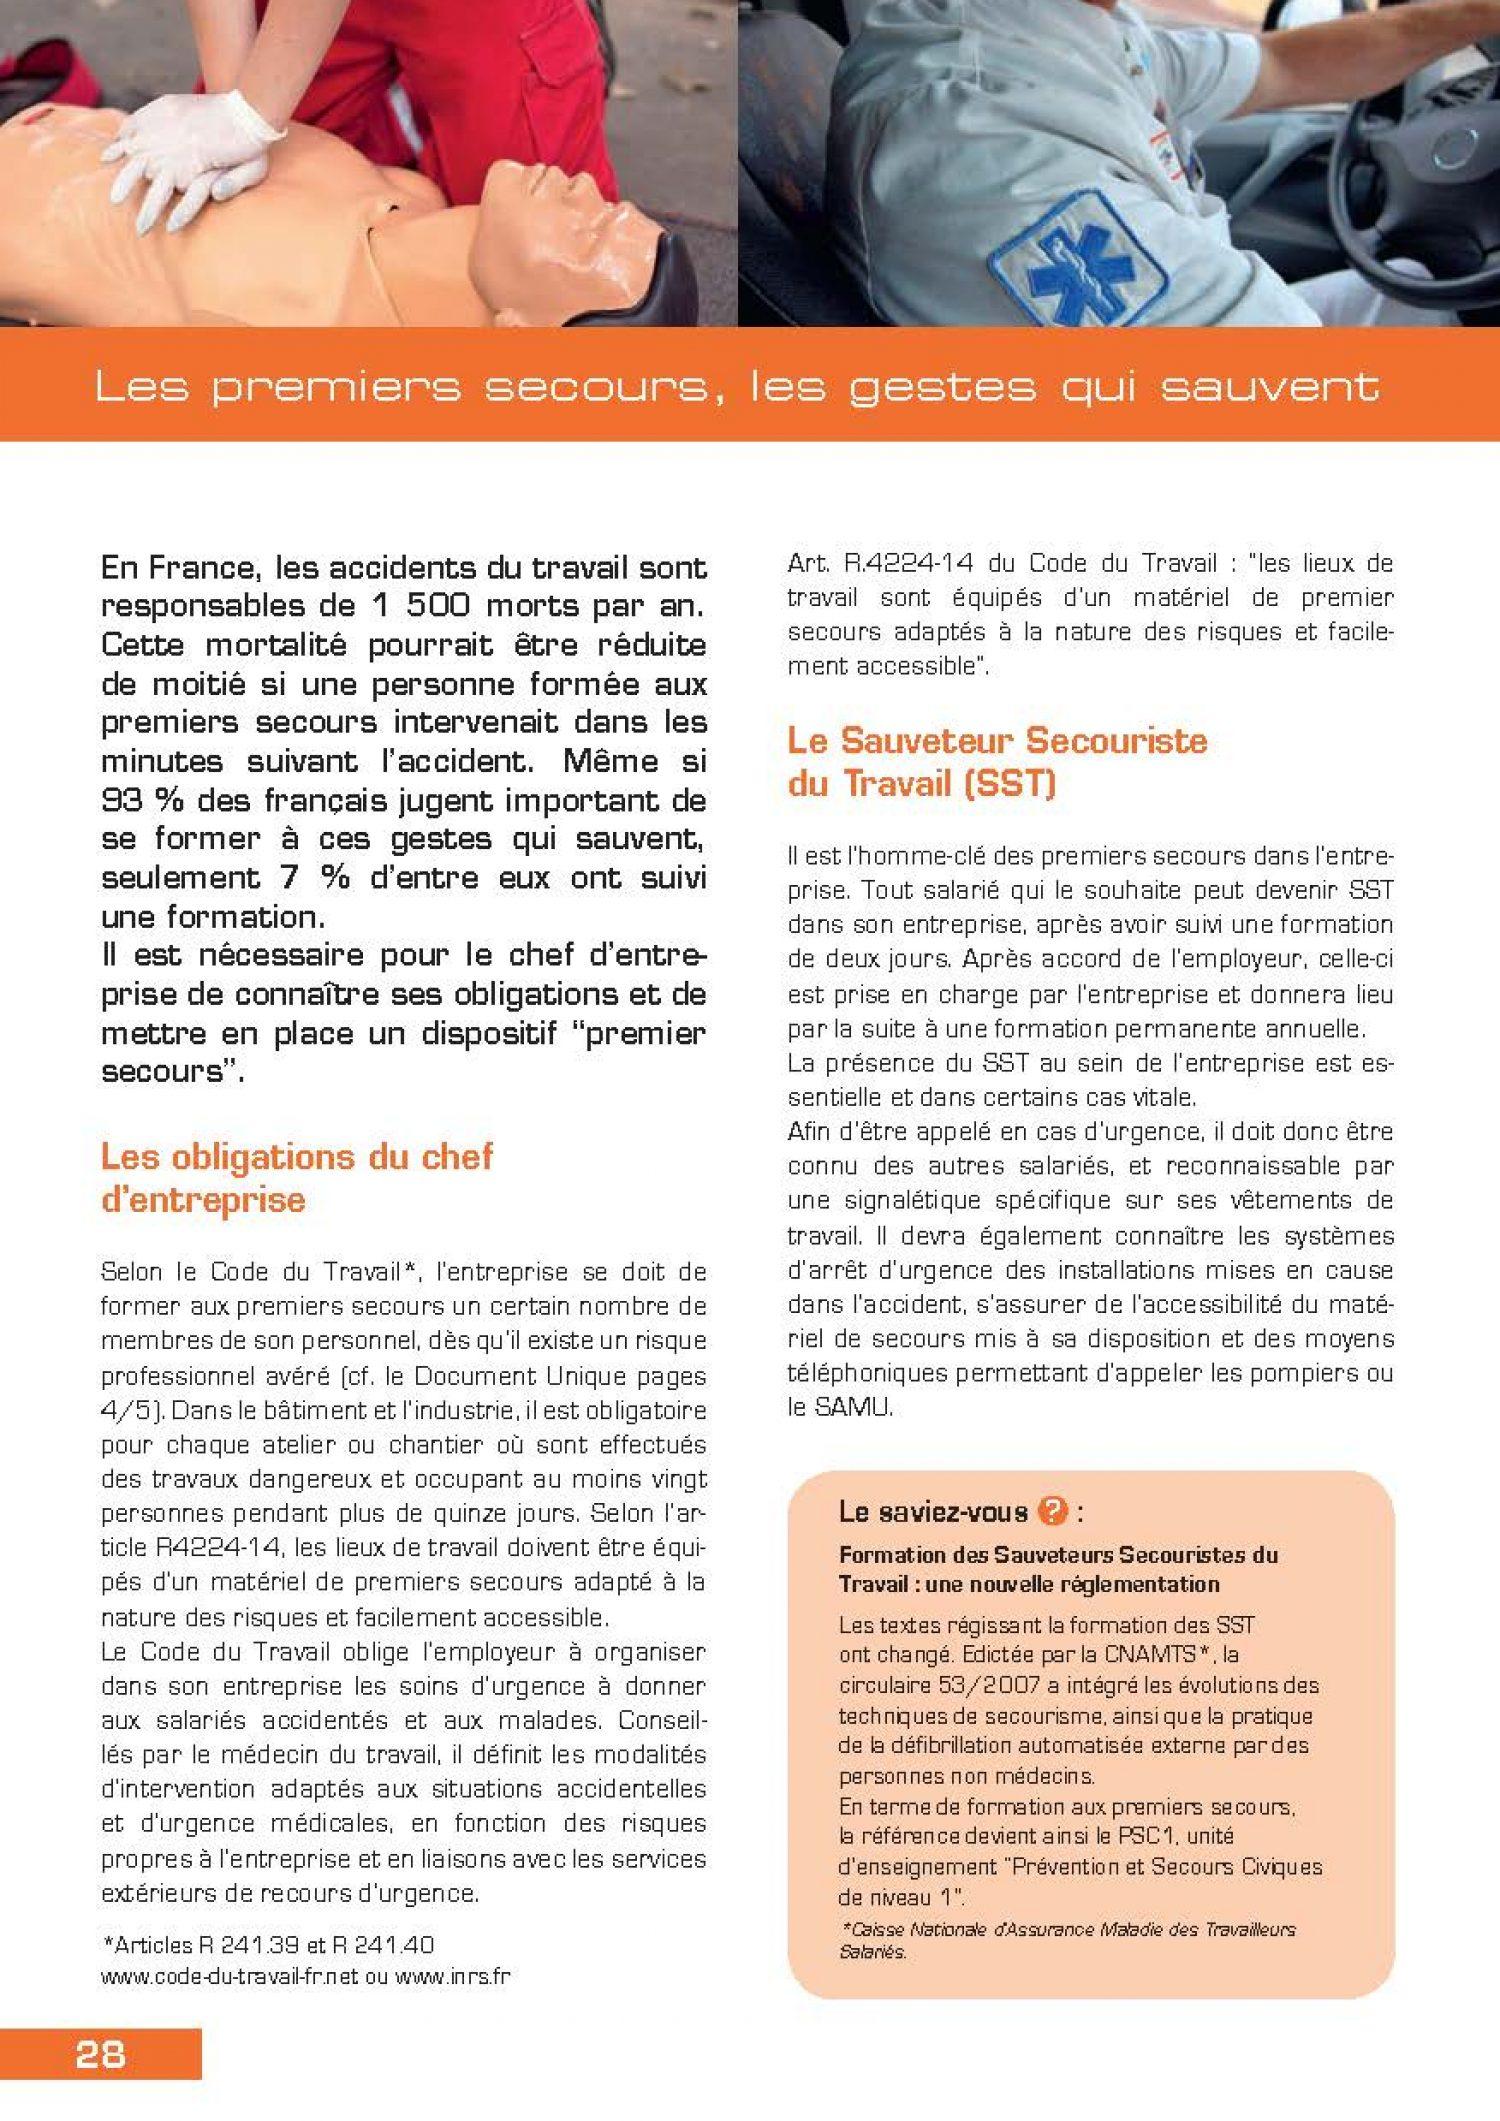 Guide Securite au Travail 2014 HDpdf_Page_28